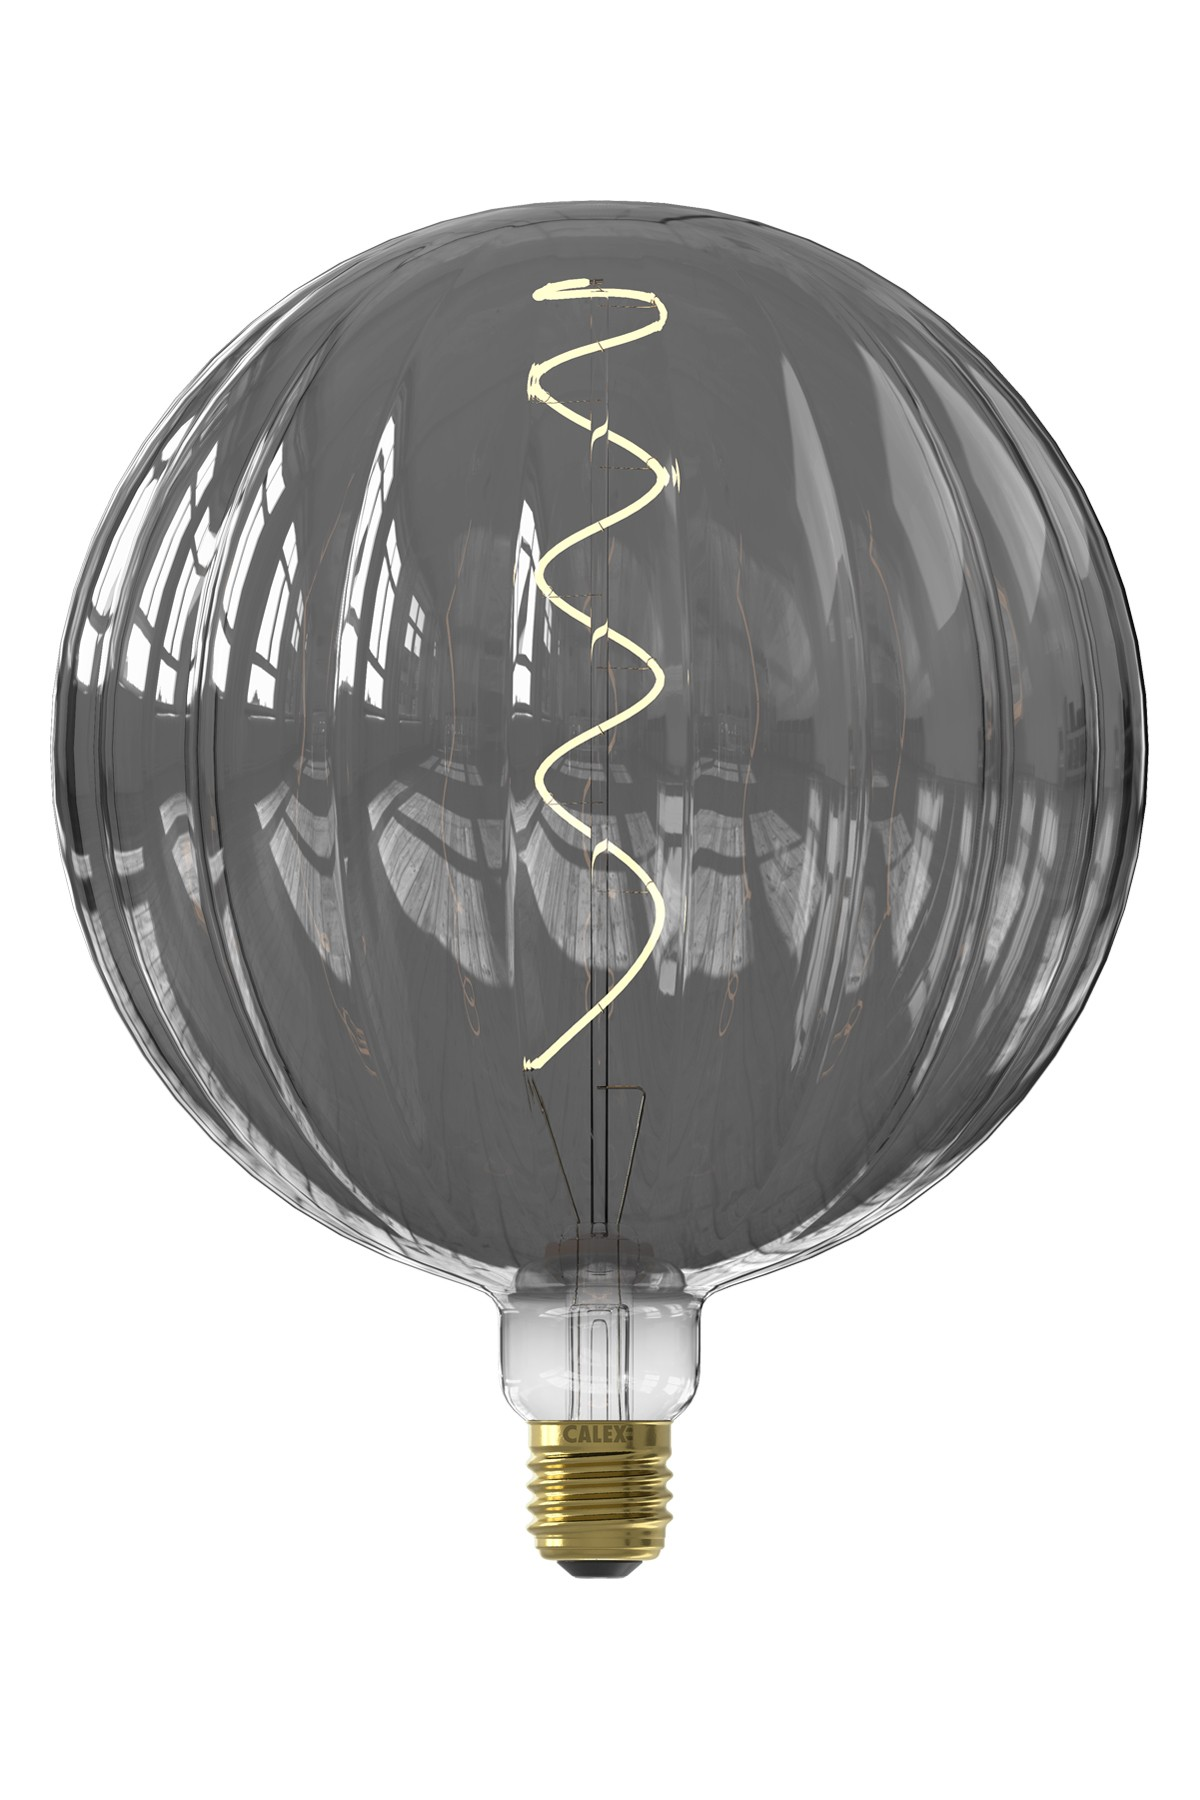 Dijon Smokey Pulse led lamp